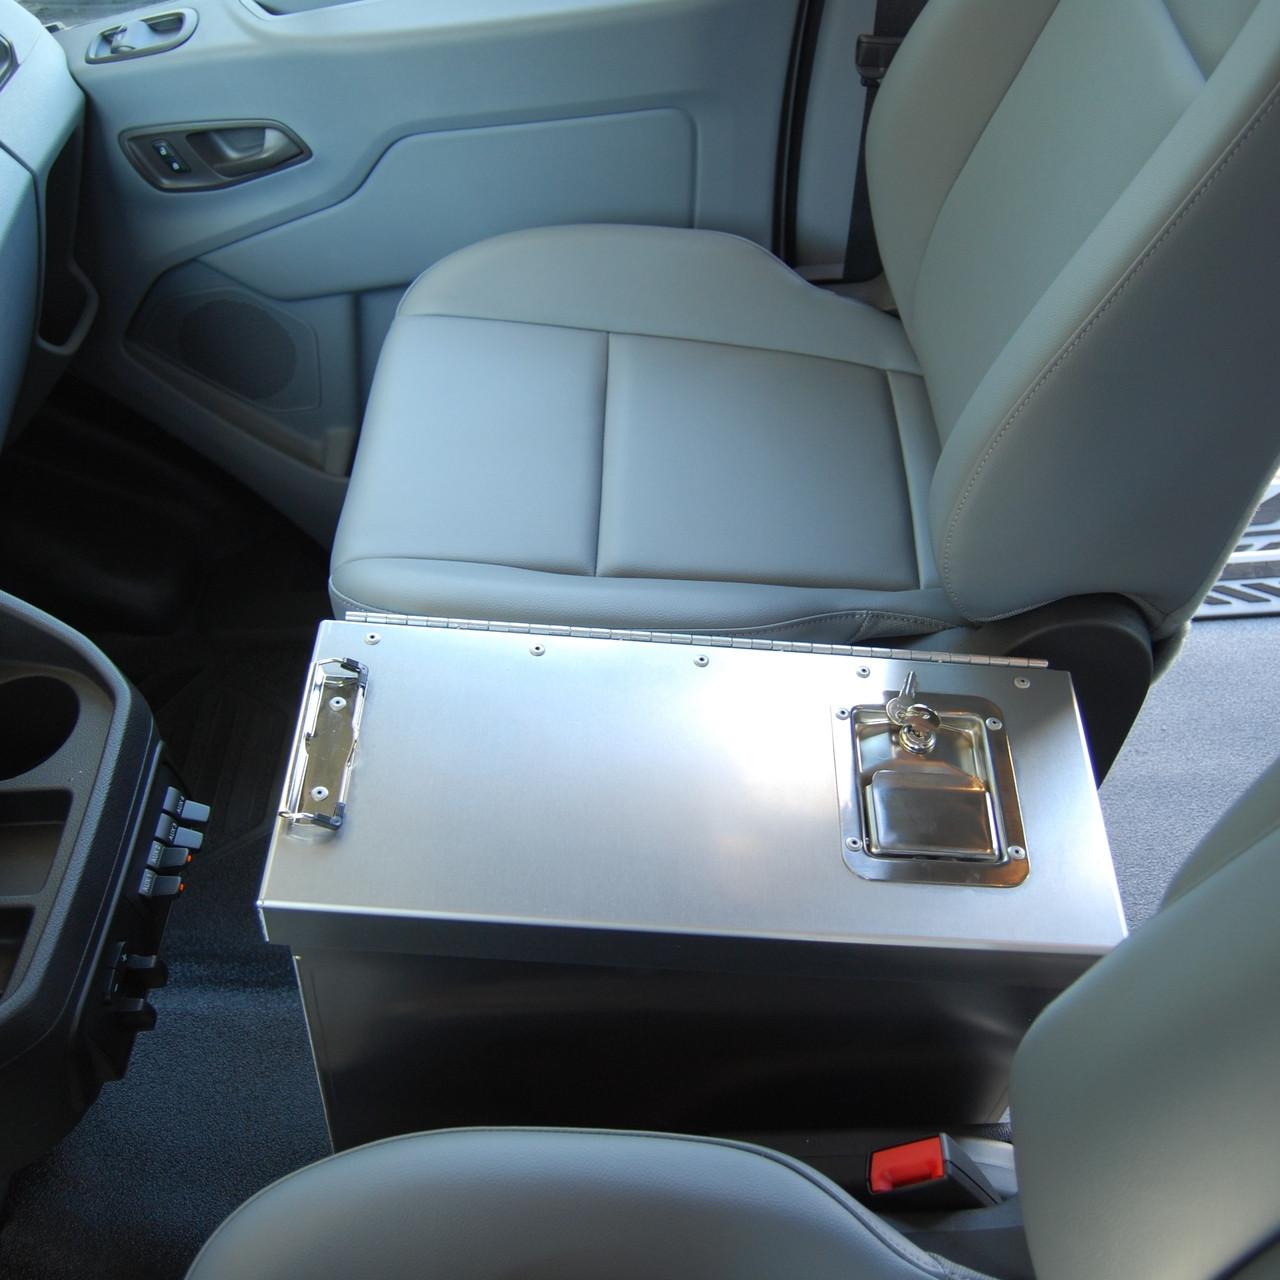 Ford Transit Commercial Van Cab Organizer Advantage